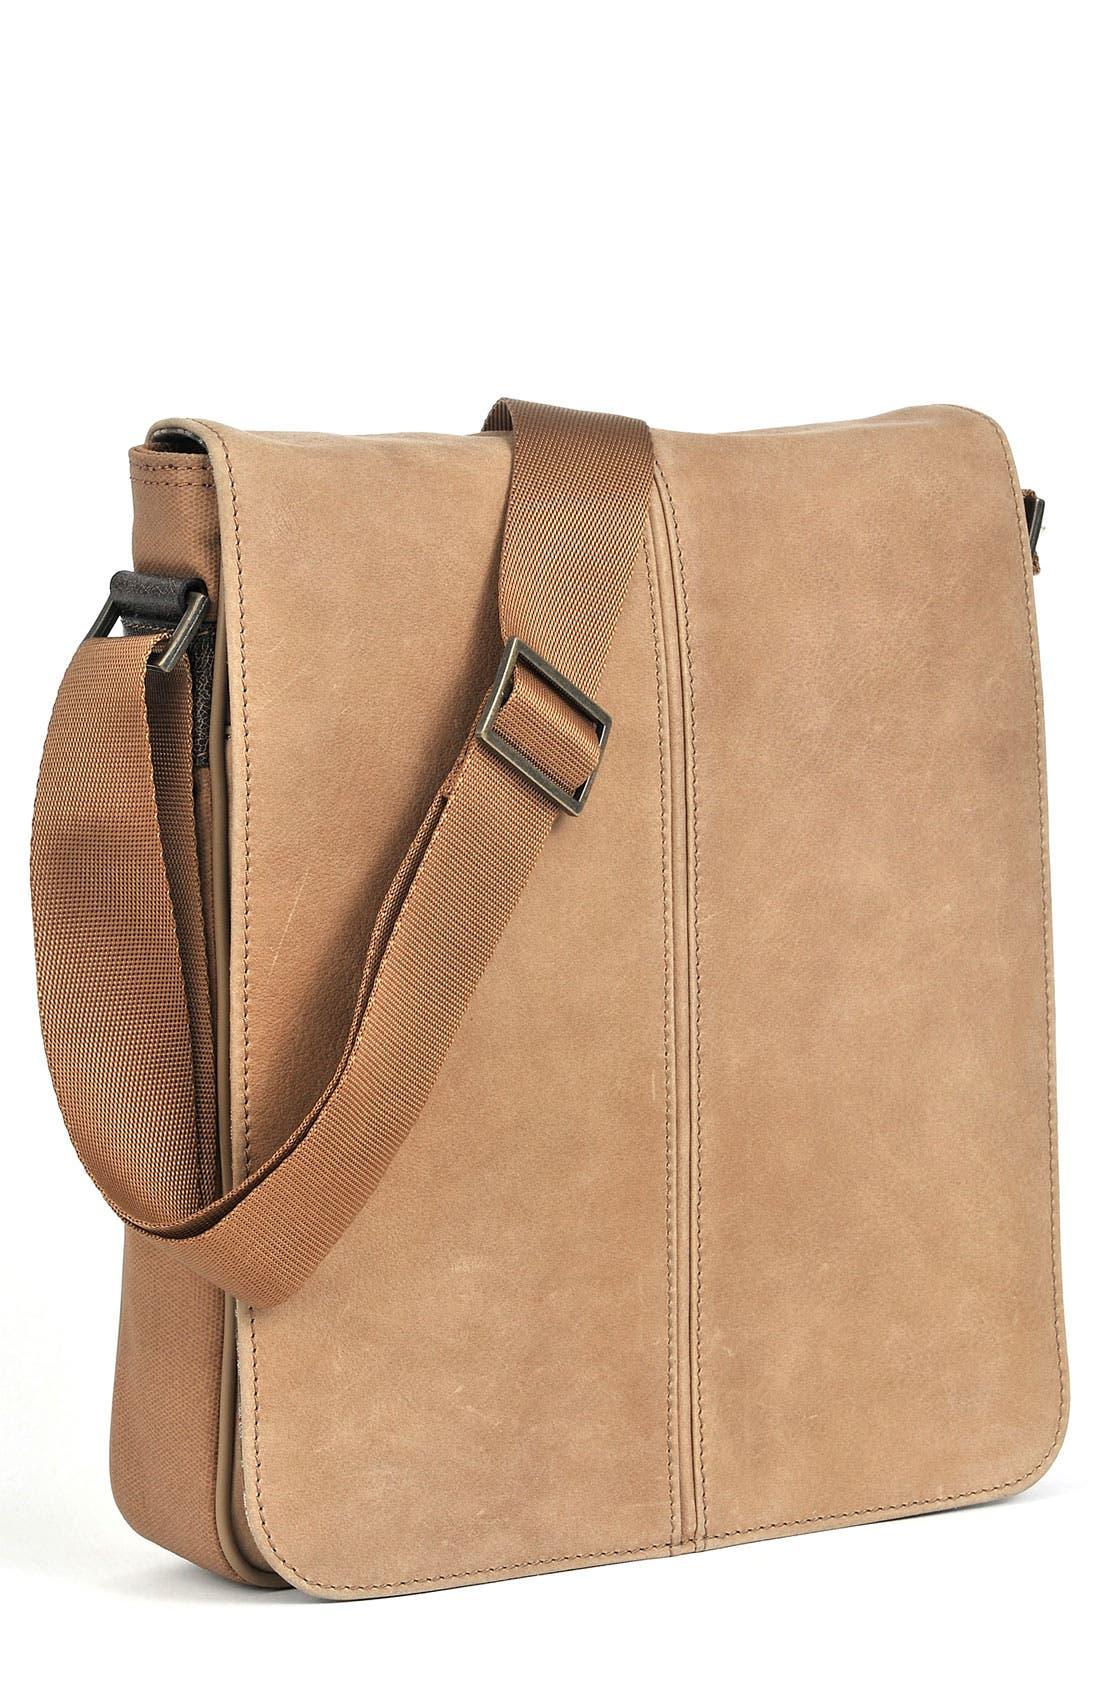 Main Image - Boconi 'Leon Mailbag' Calfskin Leather Crossbody Bag